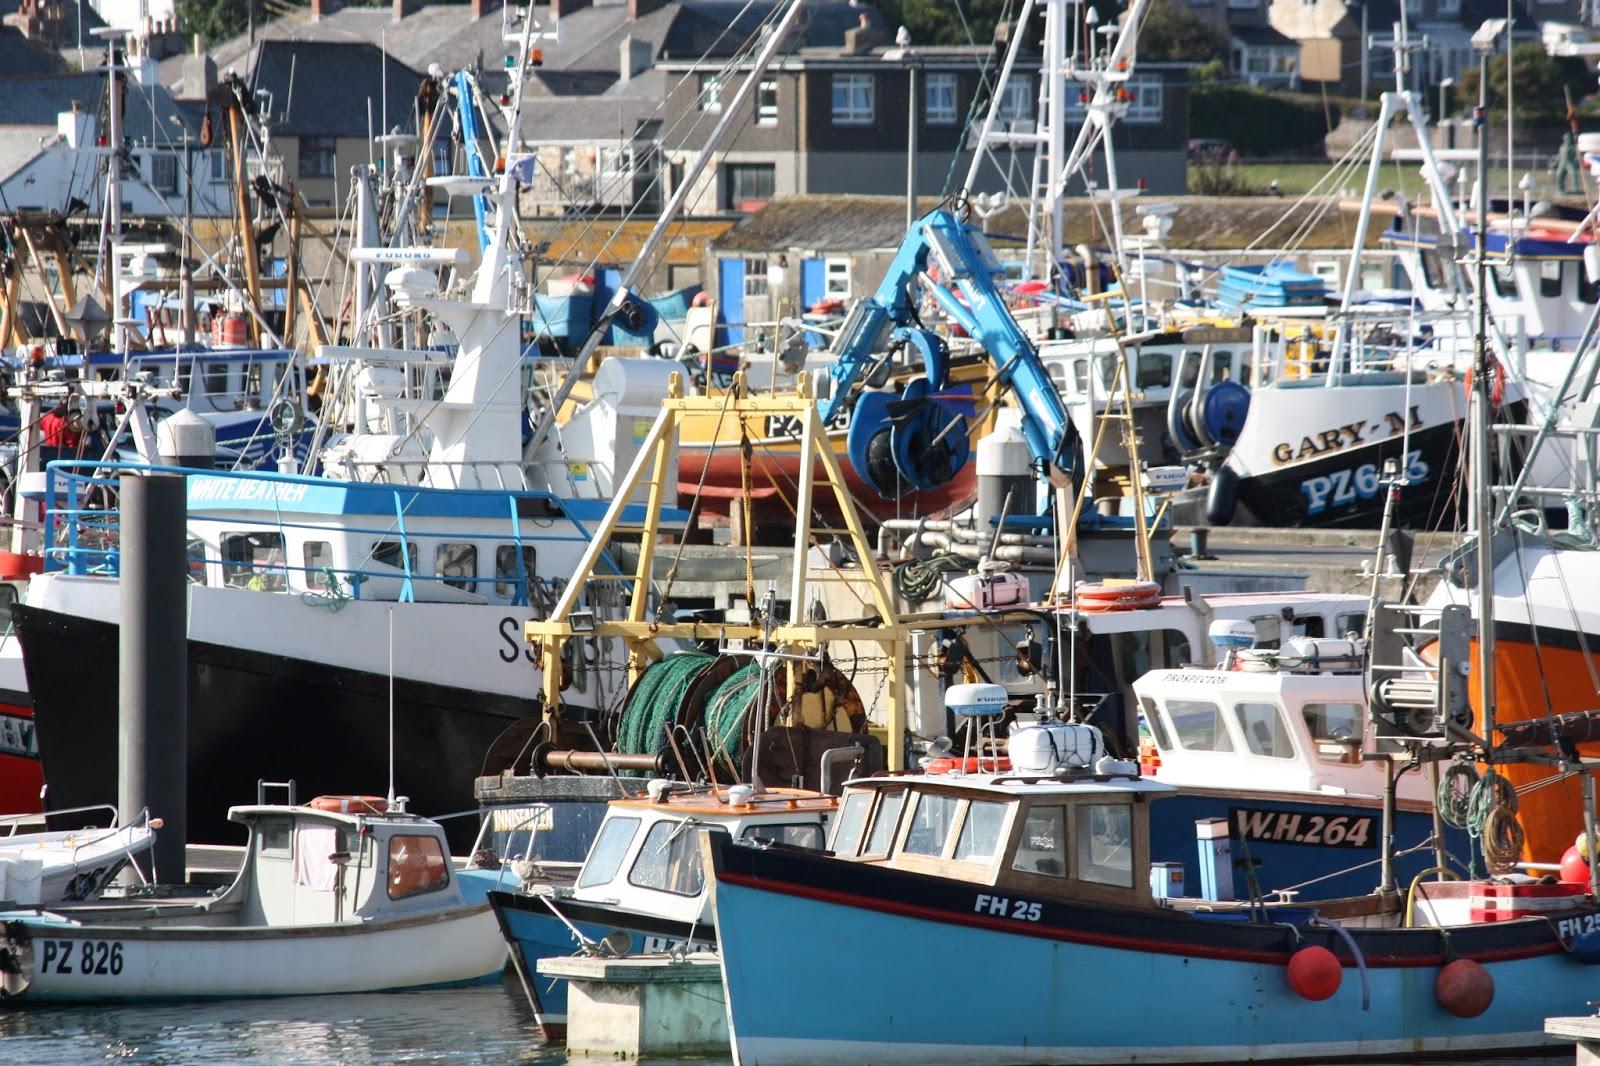 newlyn harbour restaurants